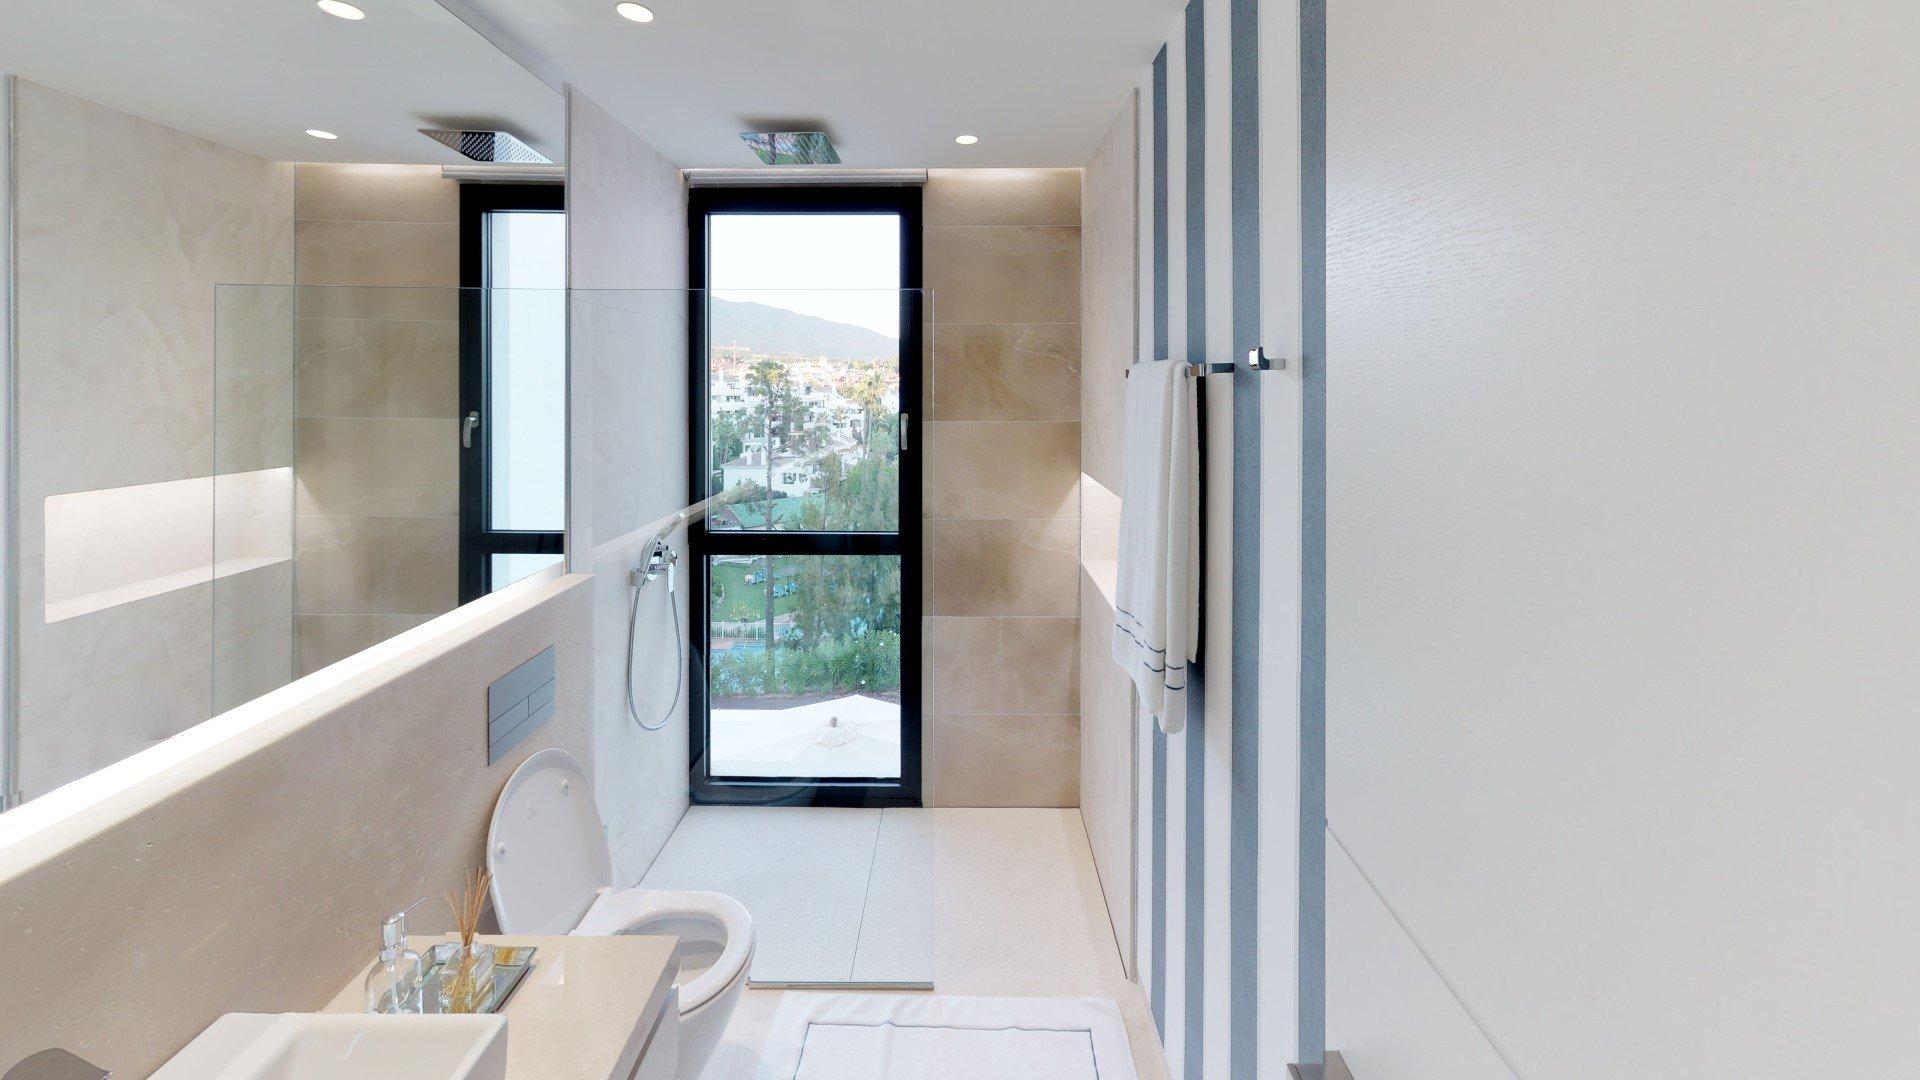 3 bedroom, 3 bathroom Penthouse for sale in Marbella Golden ...